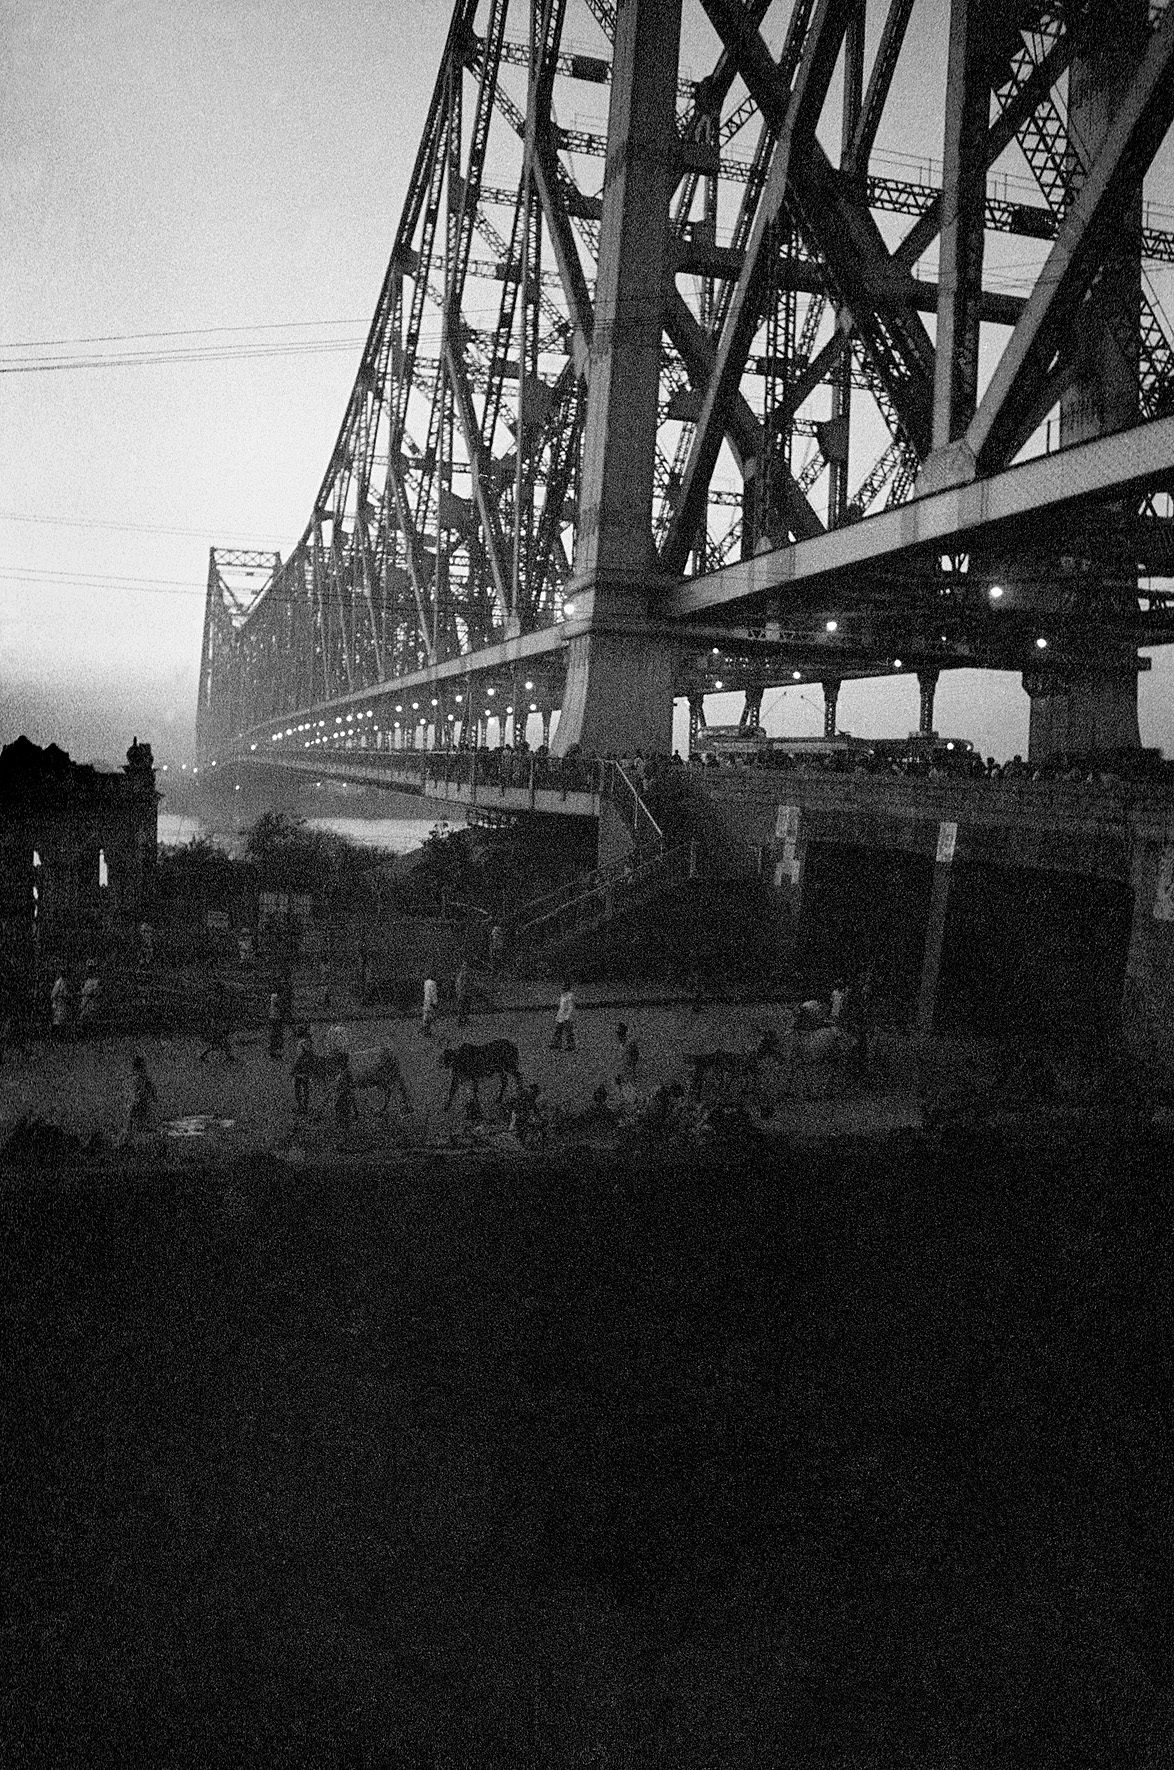 © Frank Horvat – Howrah bridge, at dusk, India, 1962, Courtesy KLV Art Projects